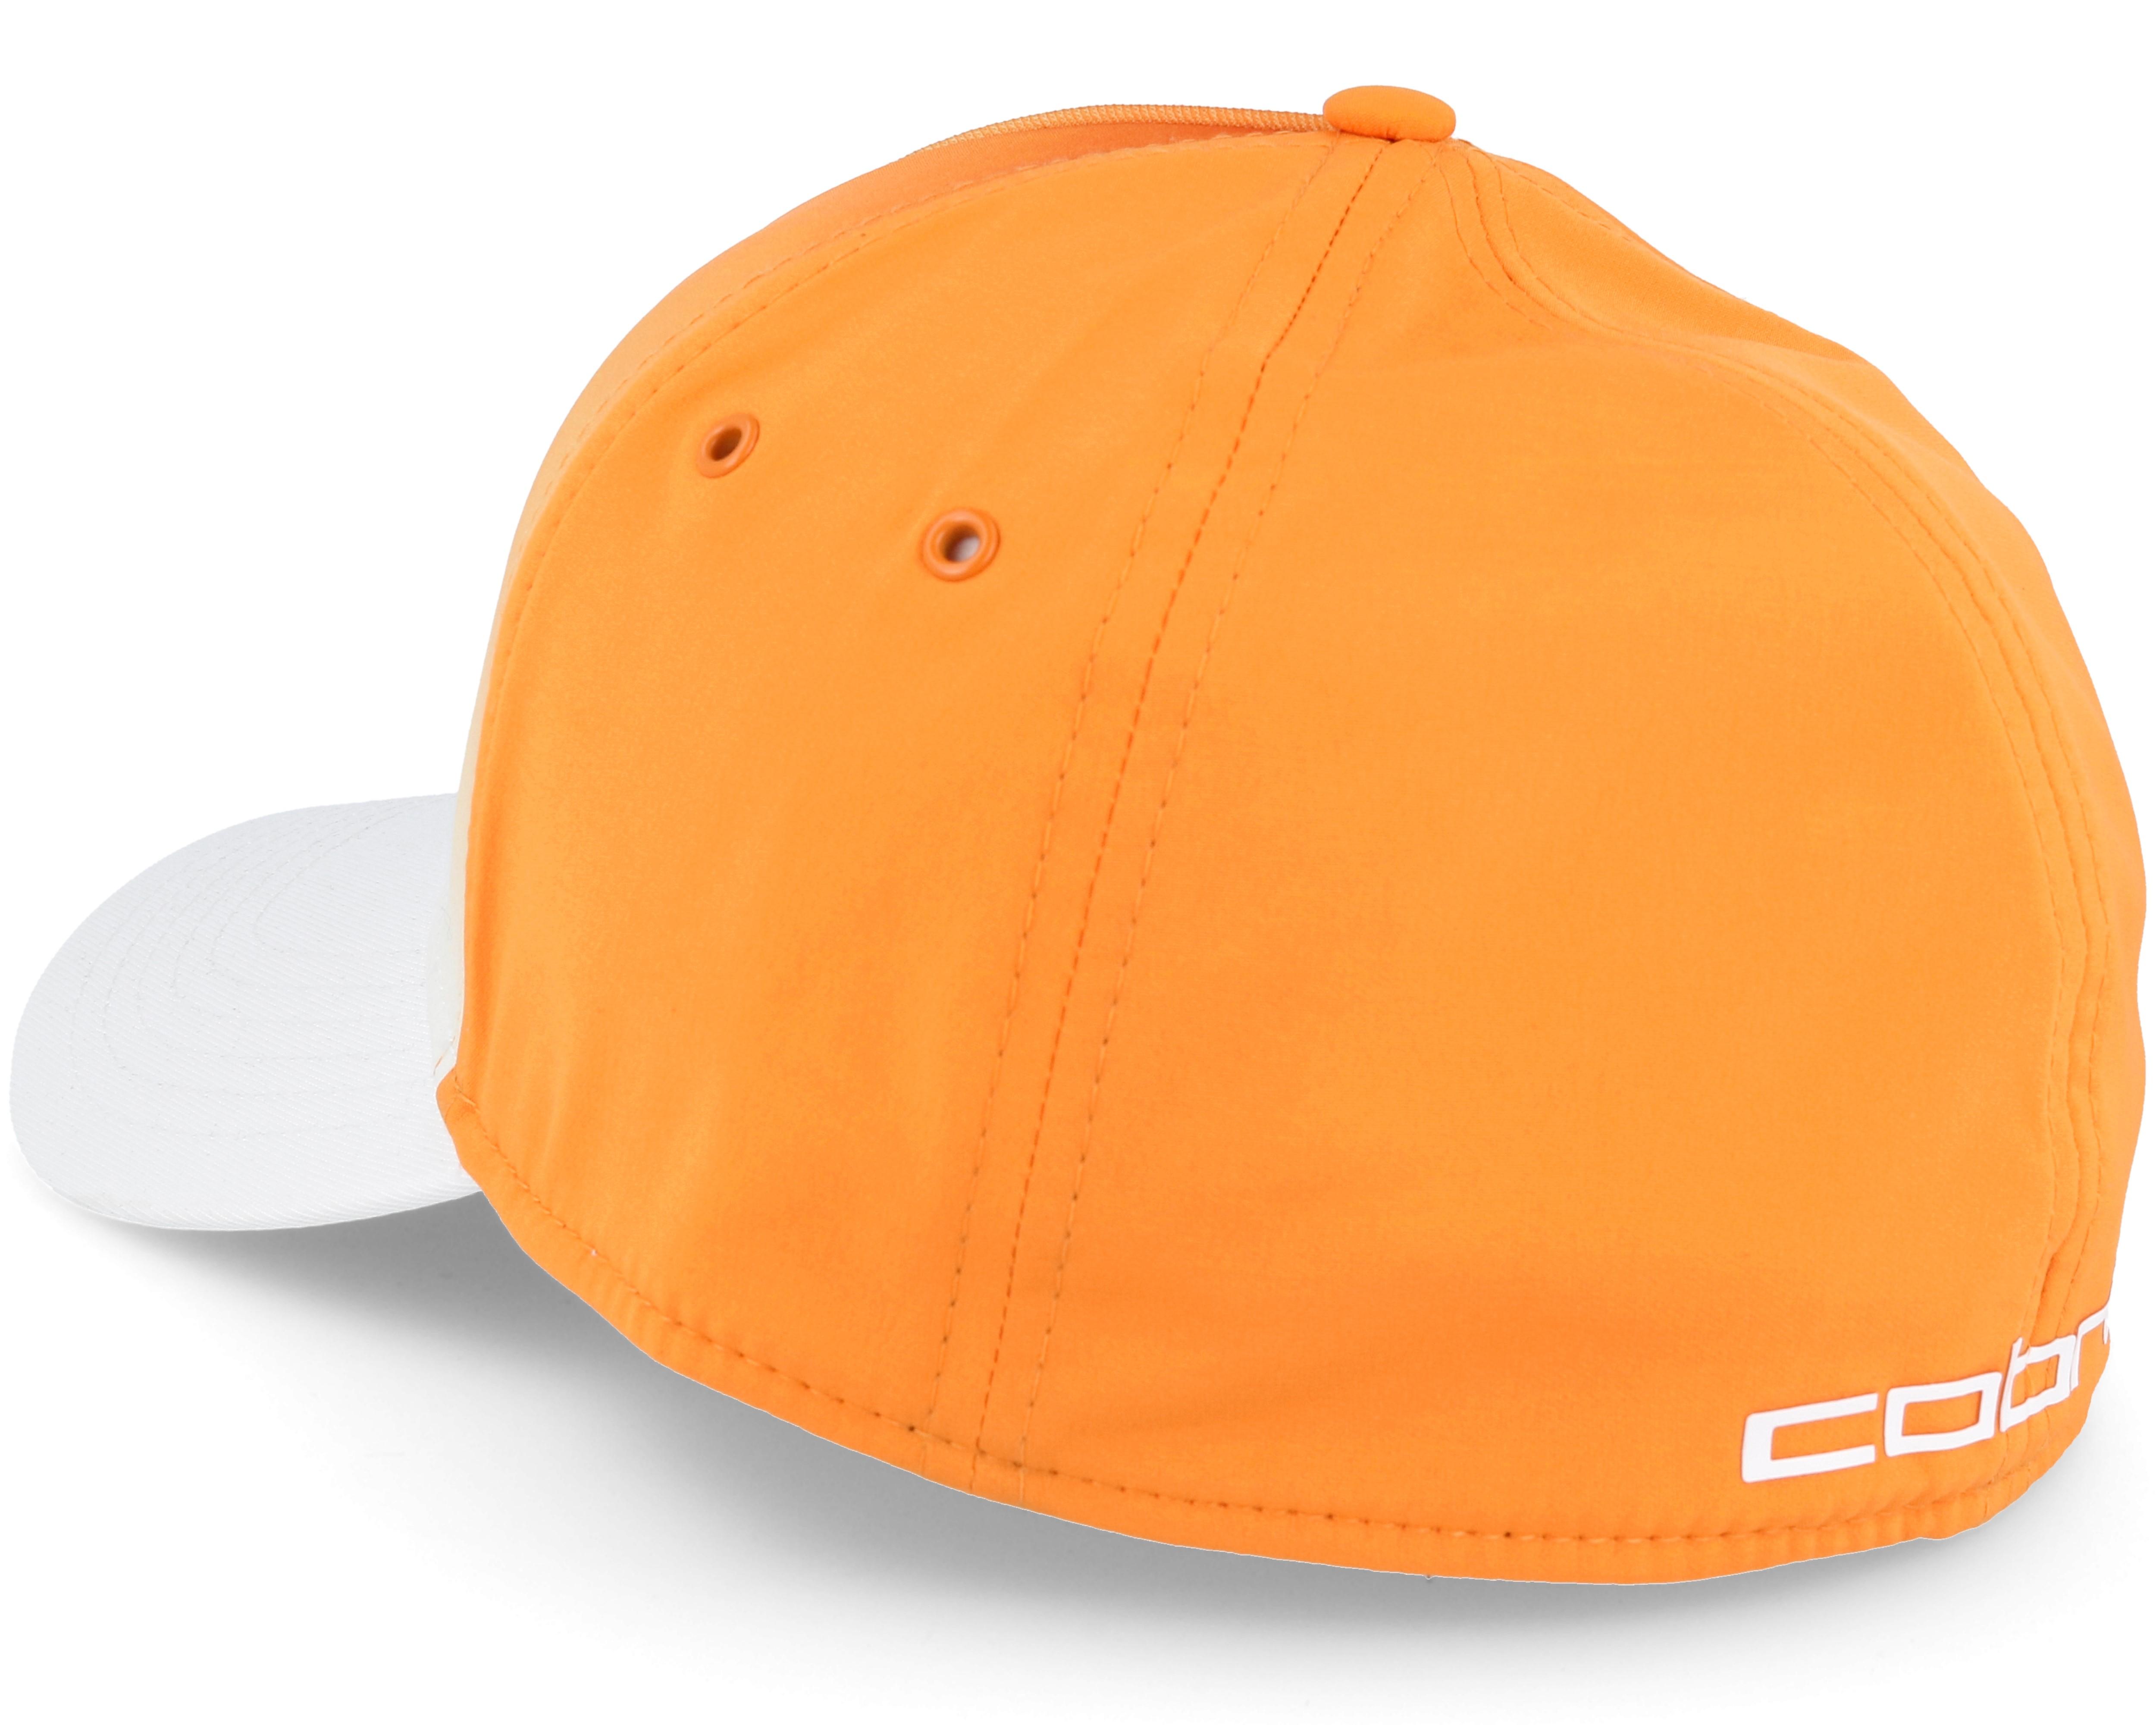 tour fade orange white multi flexfit cobra keps. Black Bedroom Furniture Sets. Home Design Ideas